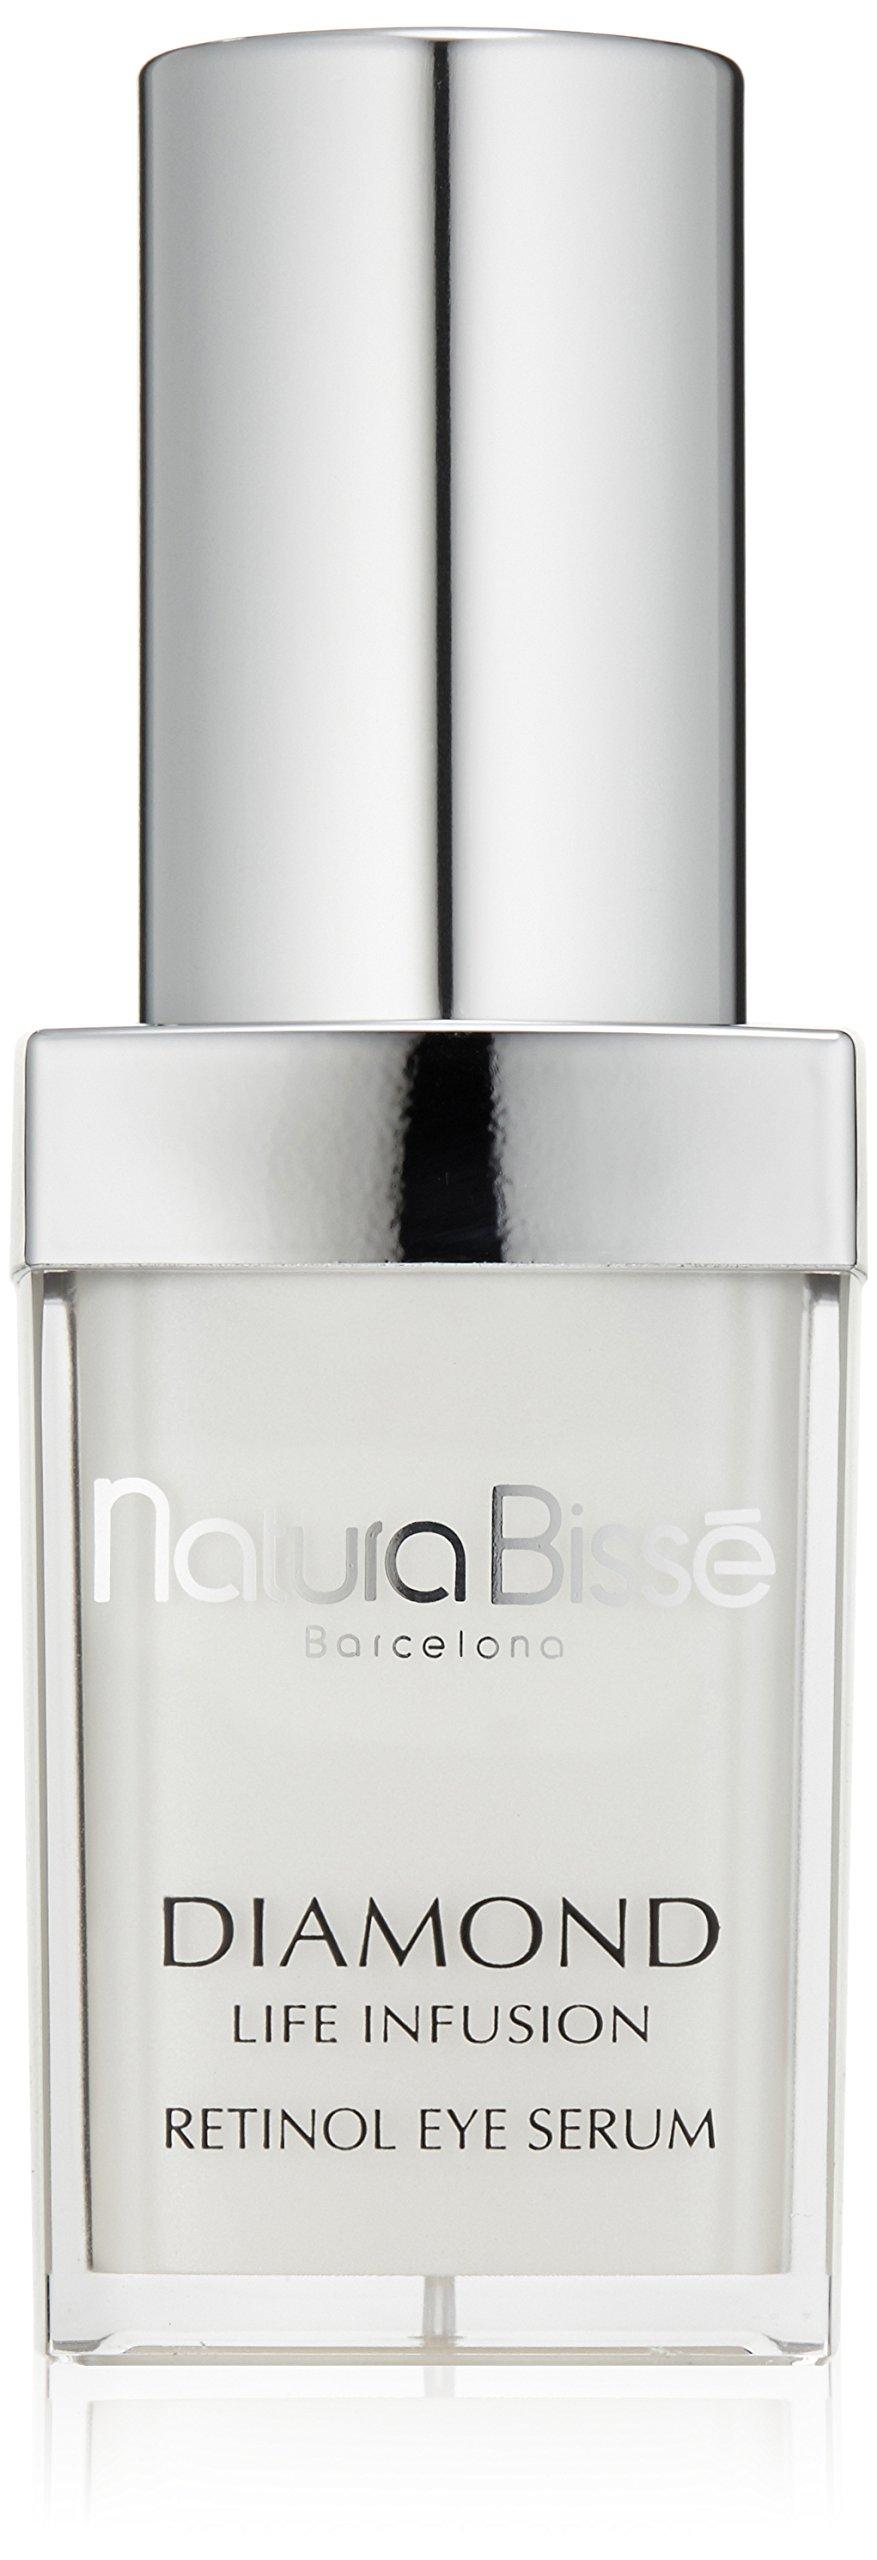 Natura Bisse Diamond Life Infusion Retinol Eye Serum, 0.5 fl. oz.